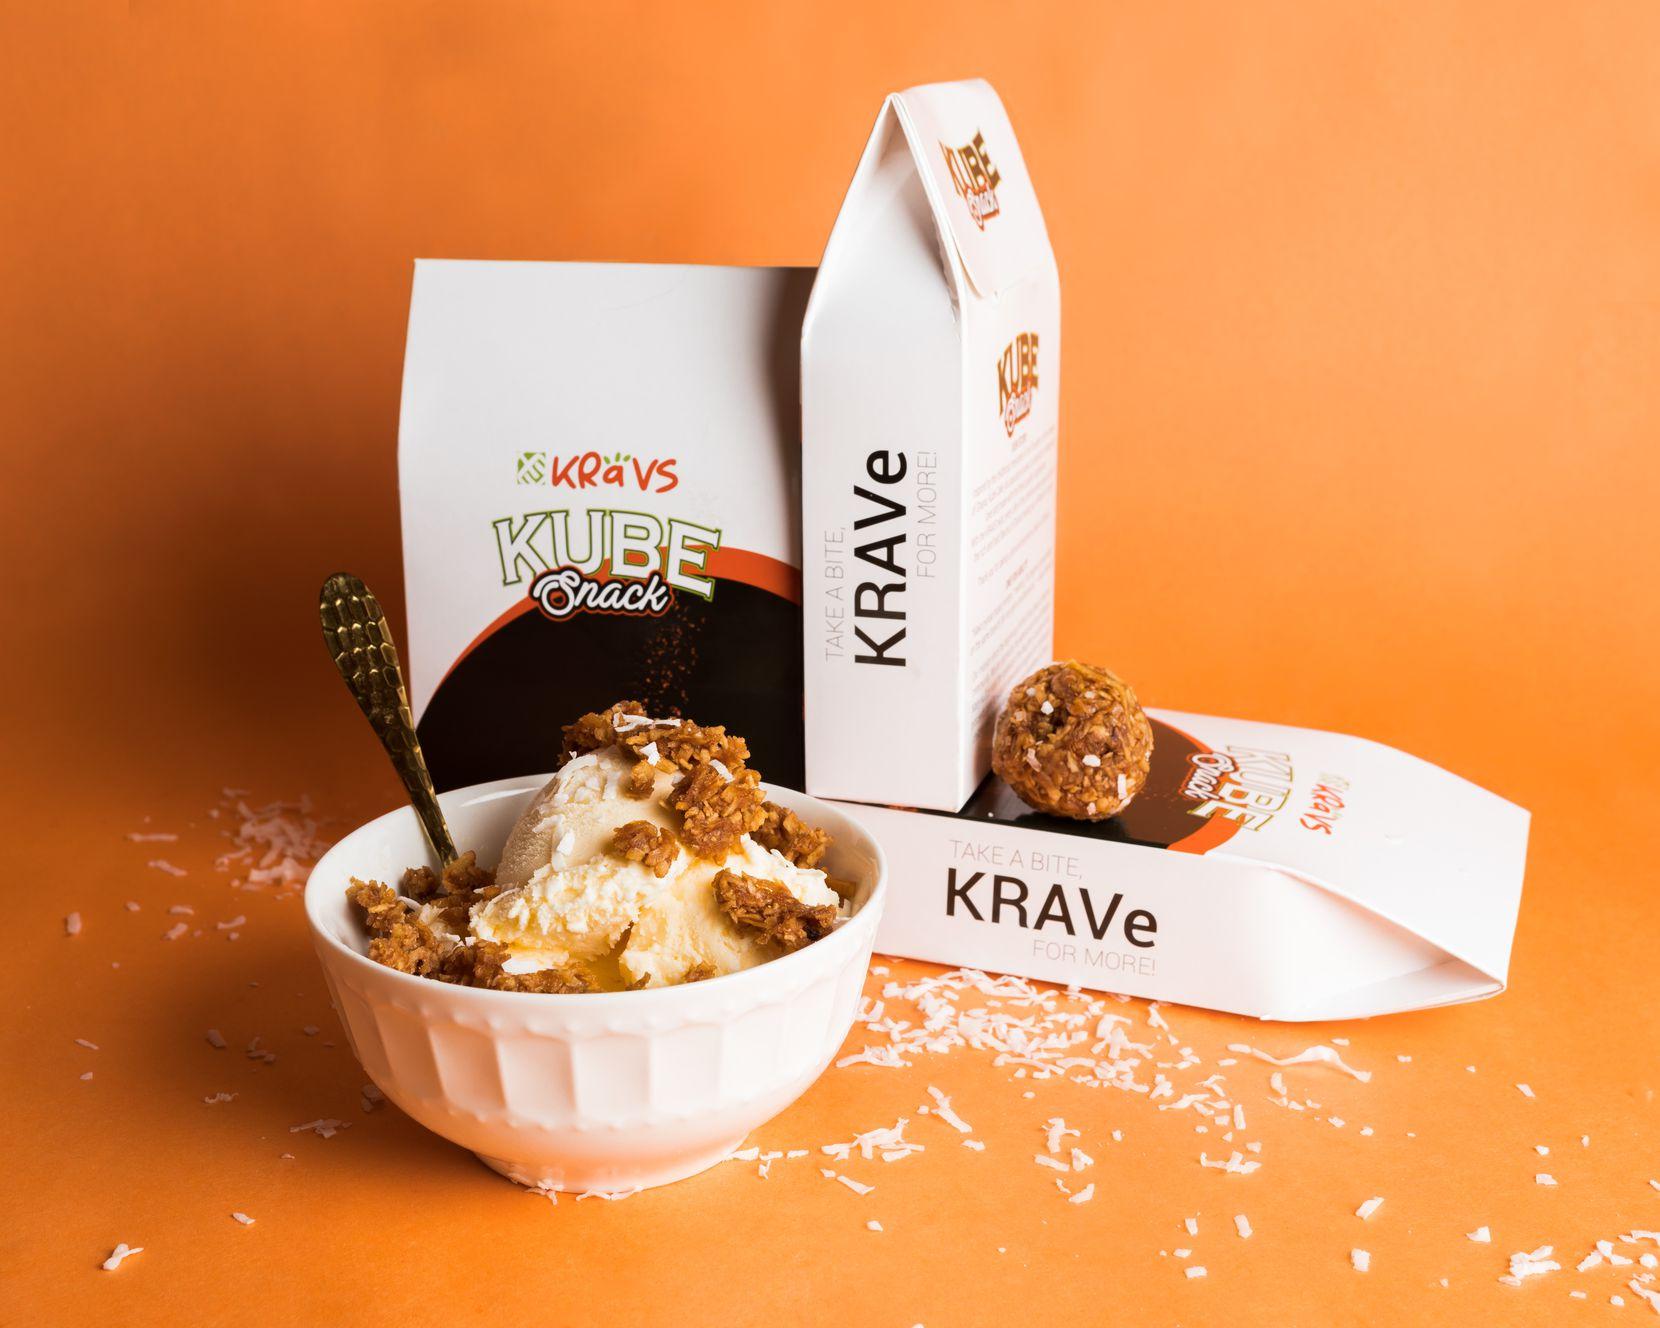 Joseline Ballard sells her Kravs pies at the Dallas Farmers Market and online.